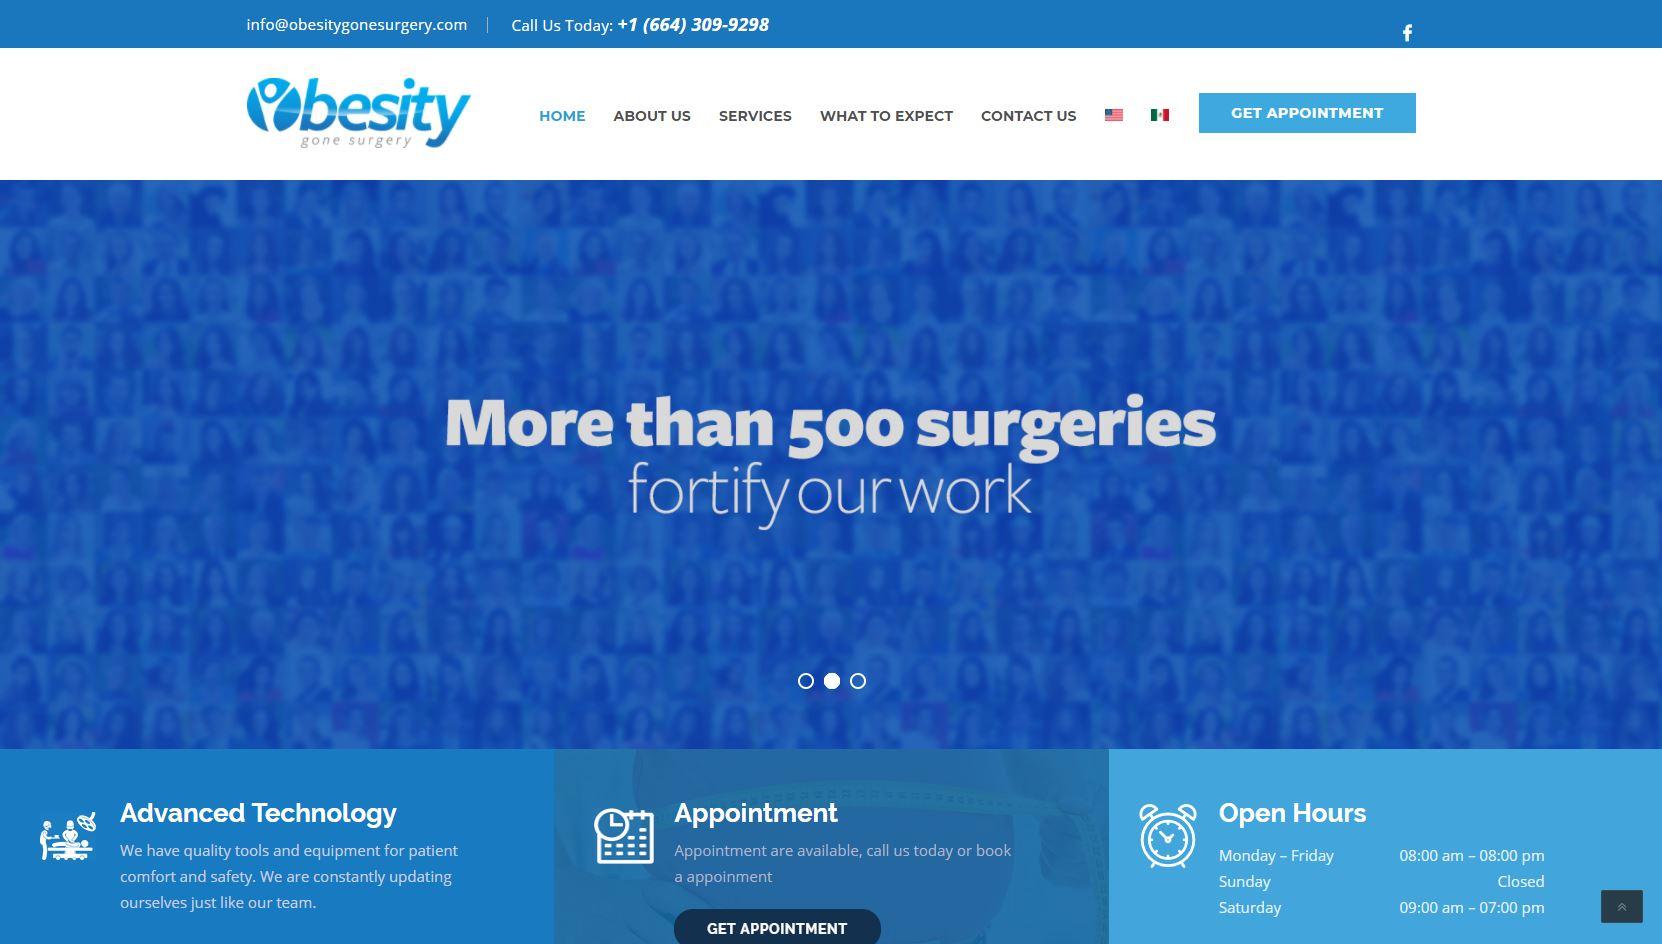 Obesity Gone Surgery